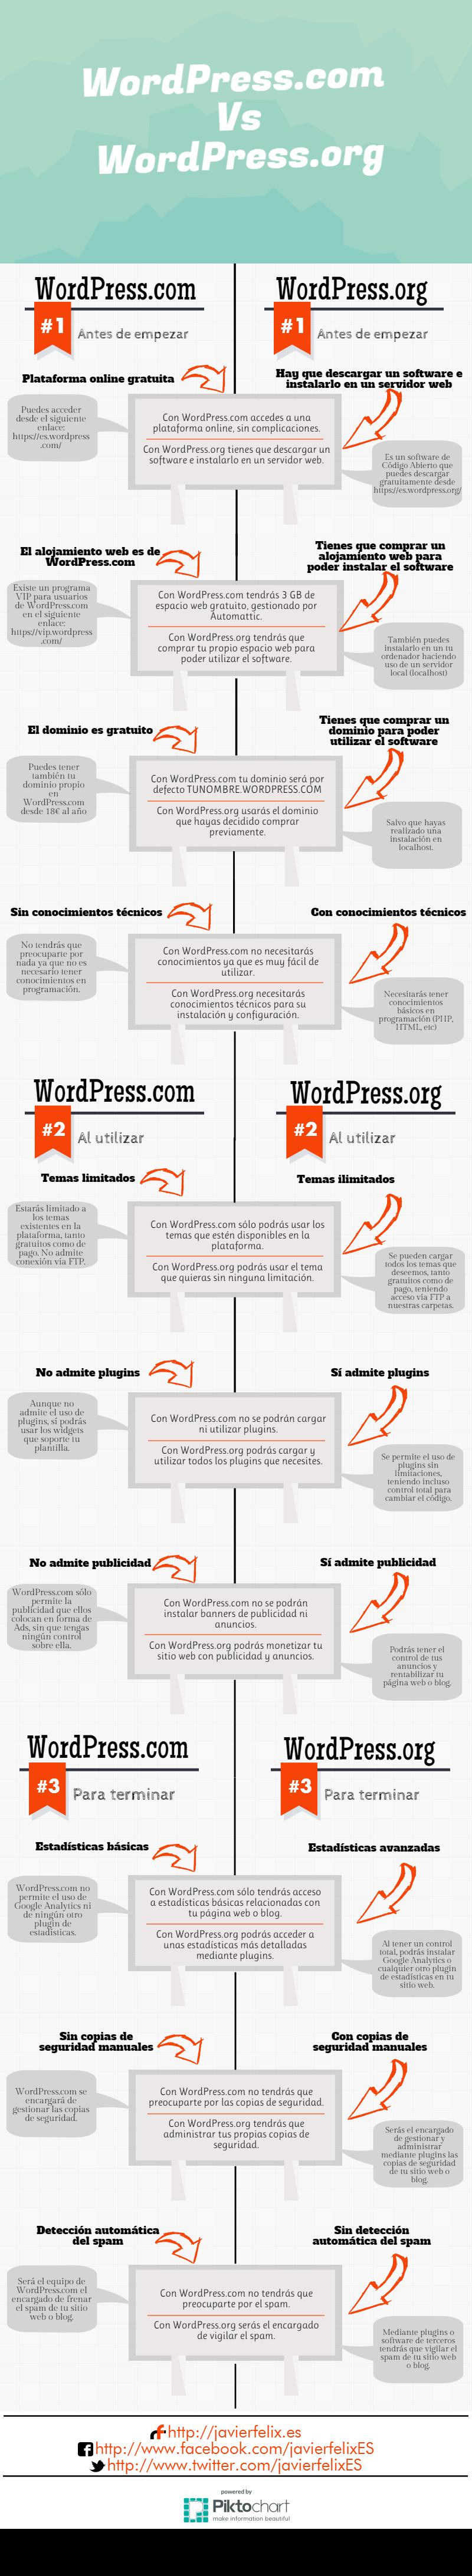 wordpress.org_y_wordpress.com